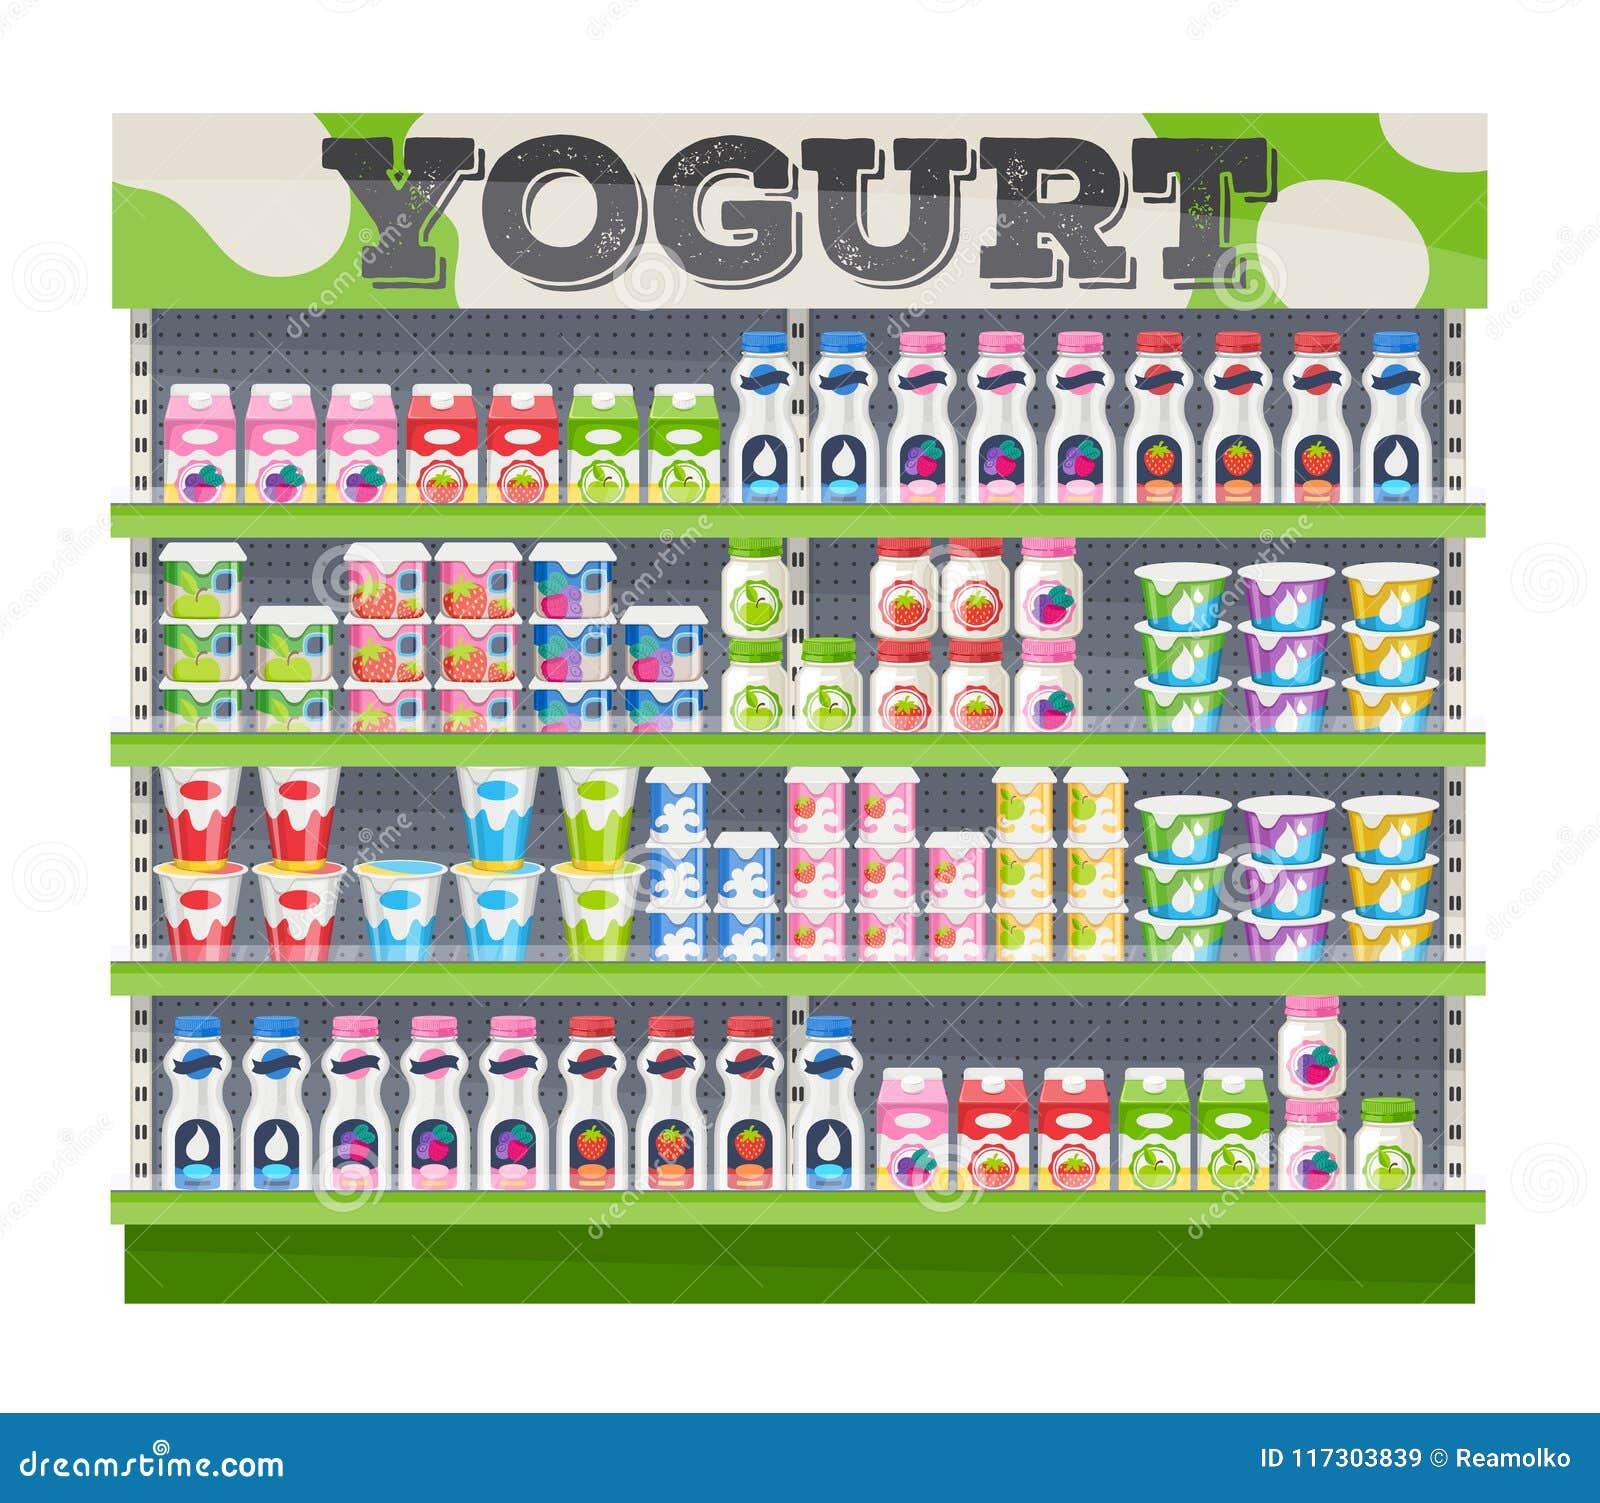 supermarket shelf display with yogurt stock vector illustration